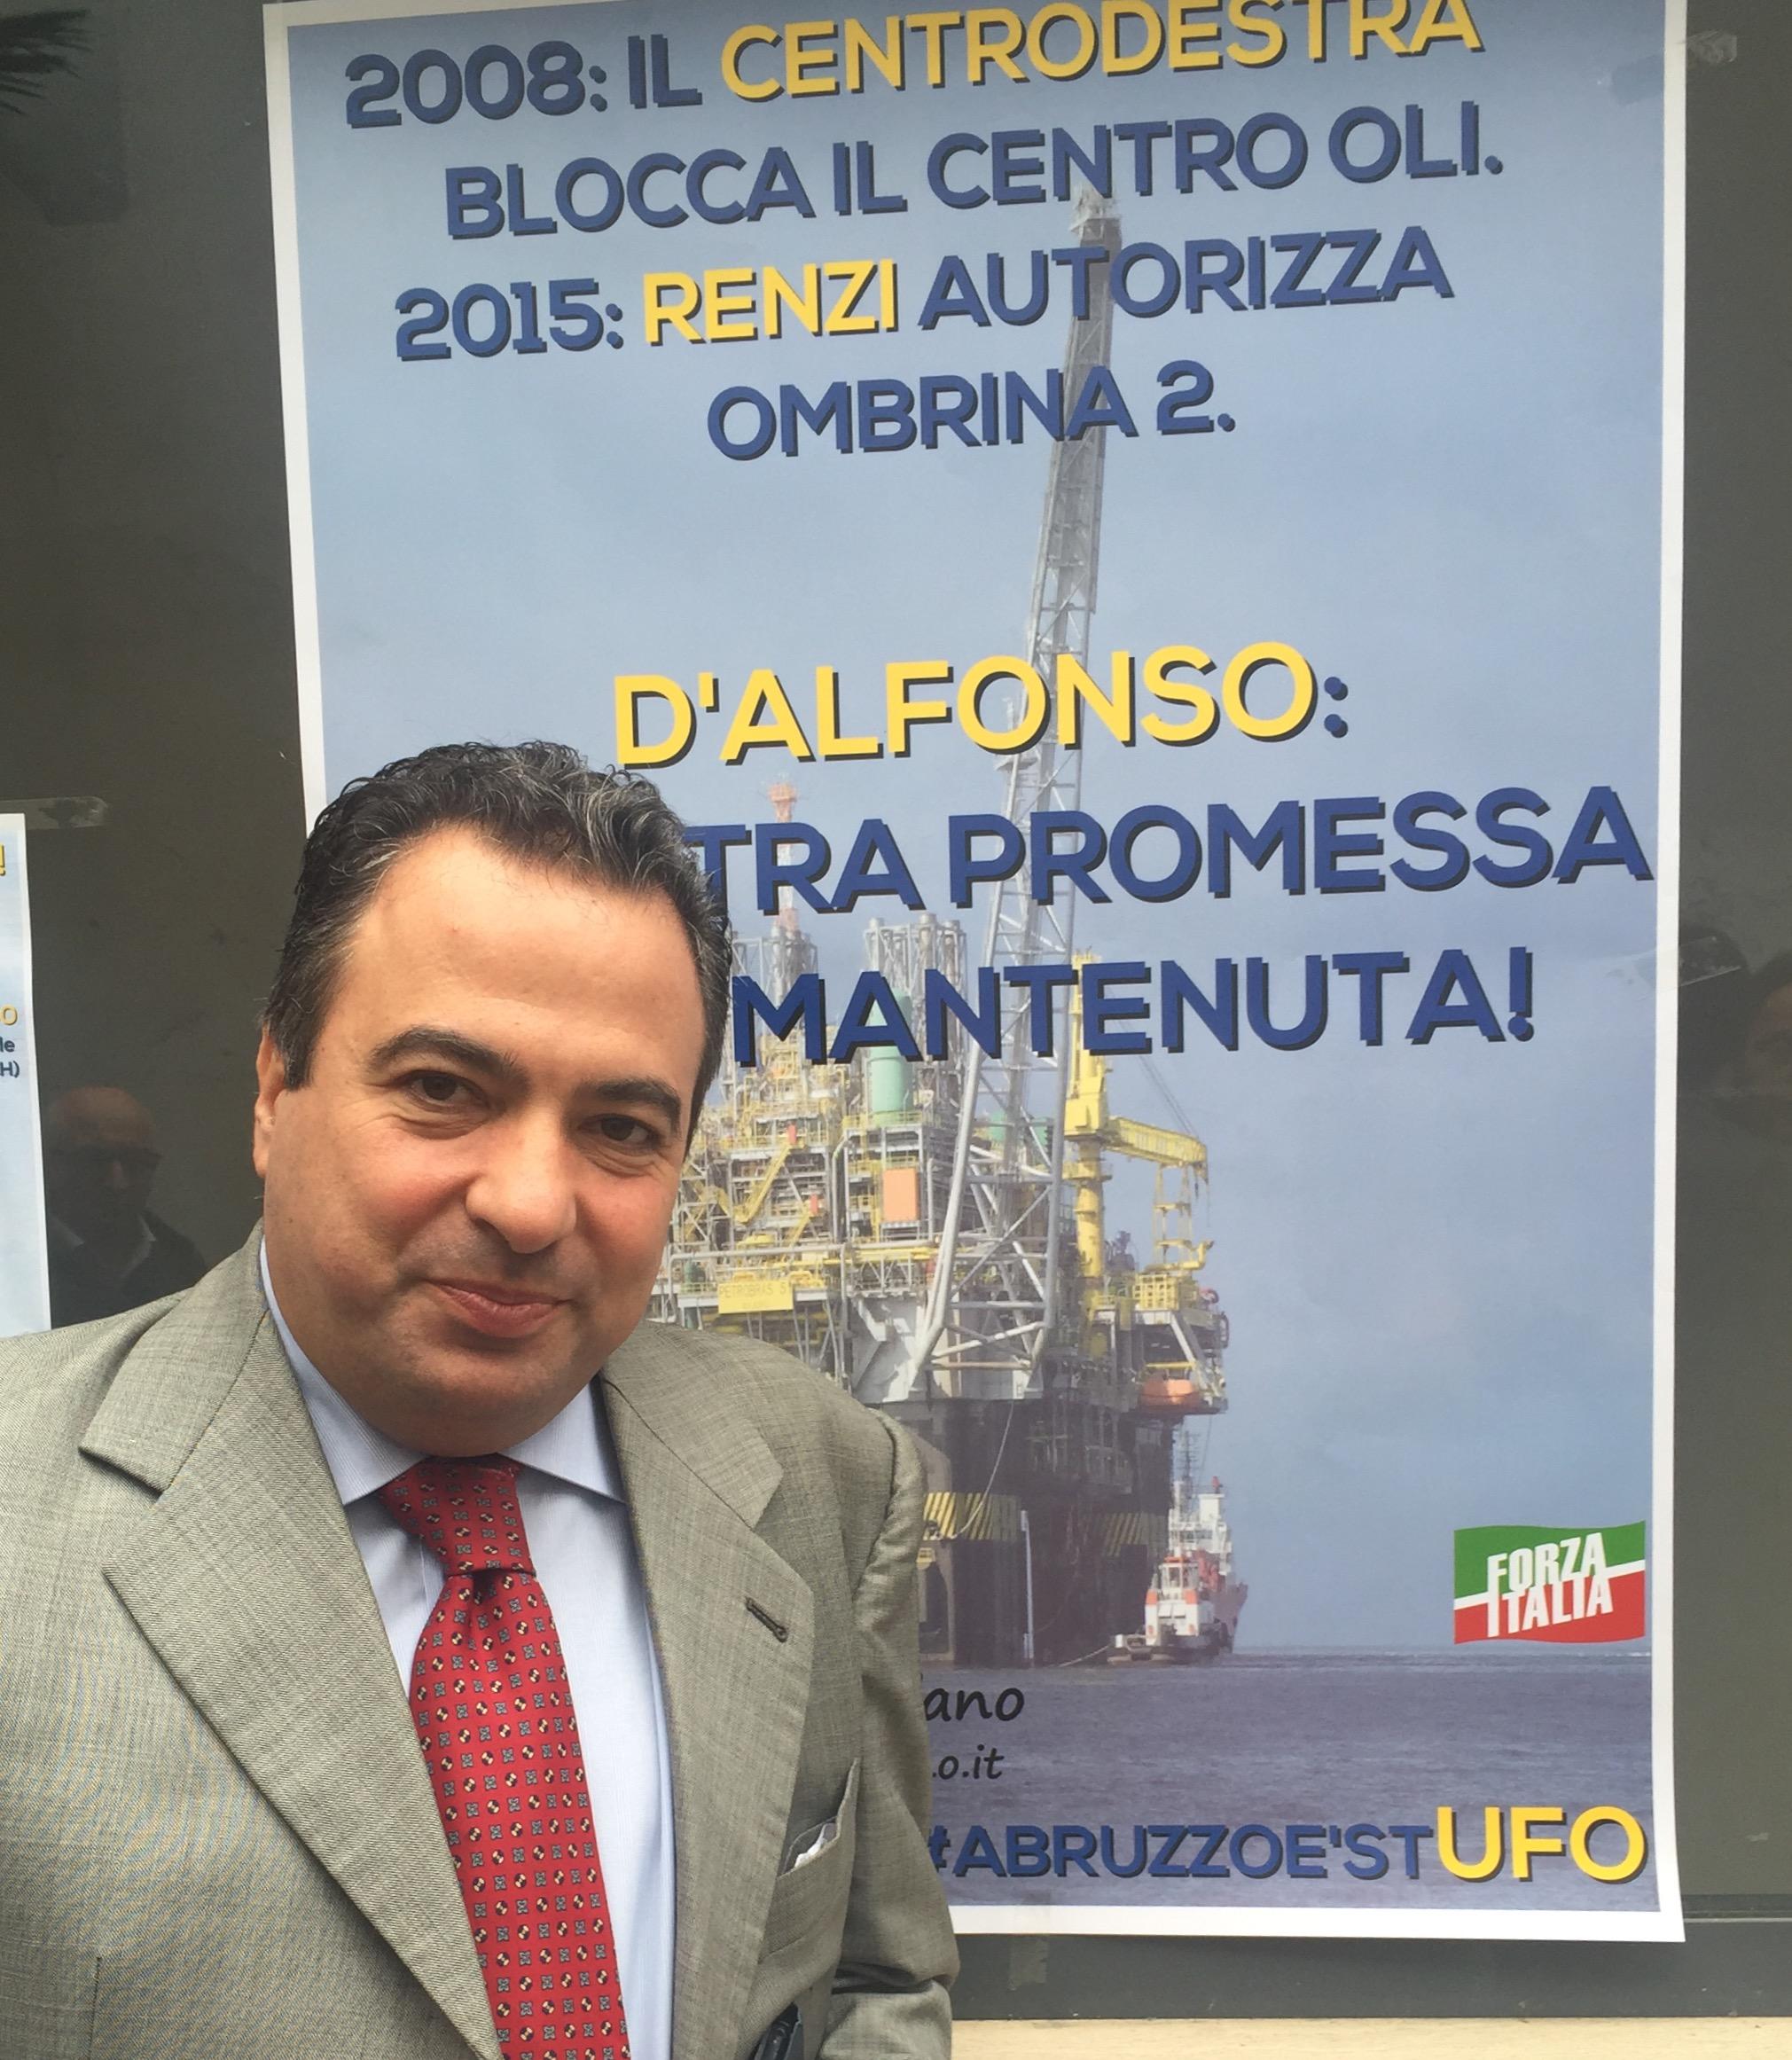 Ombrina: a San Vito manifesta il centrodestra